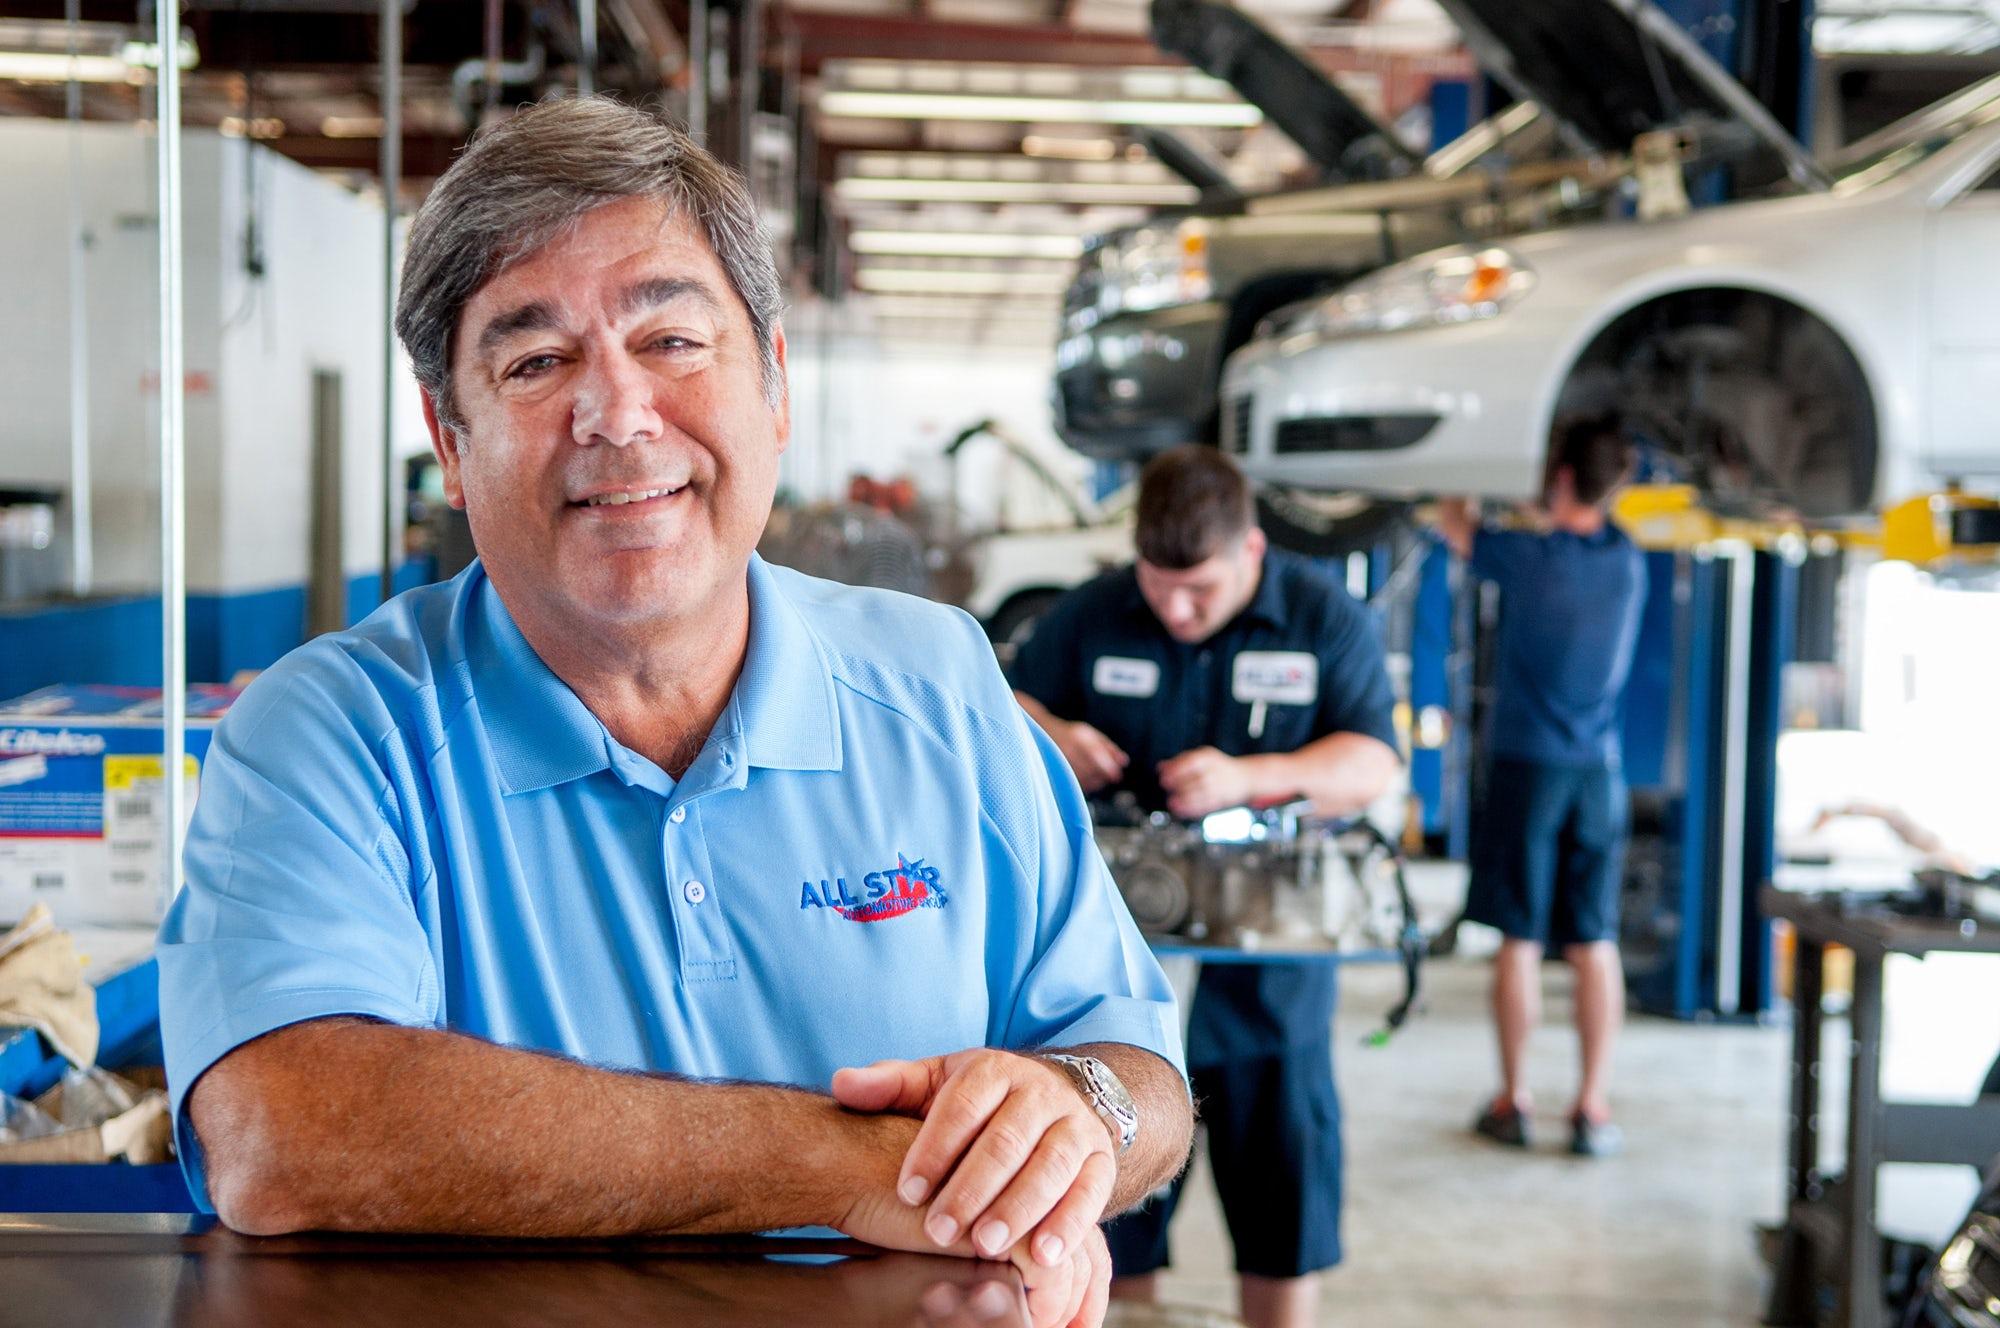 all star automotive group head matt mckay recalls the best advice